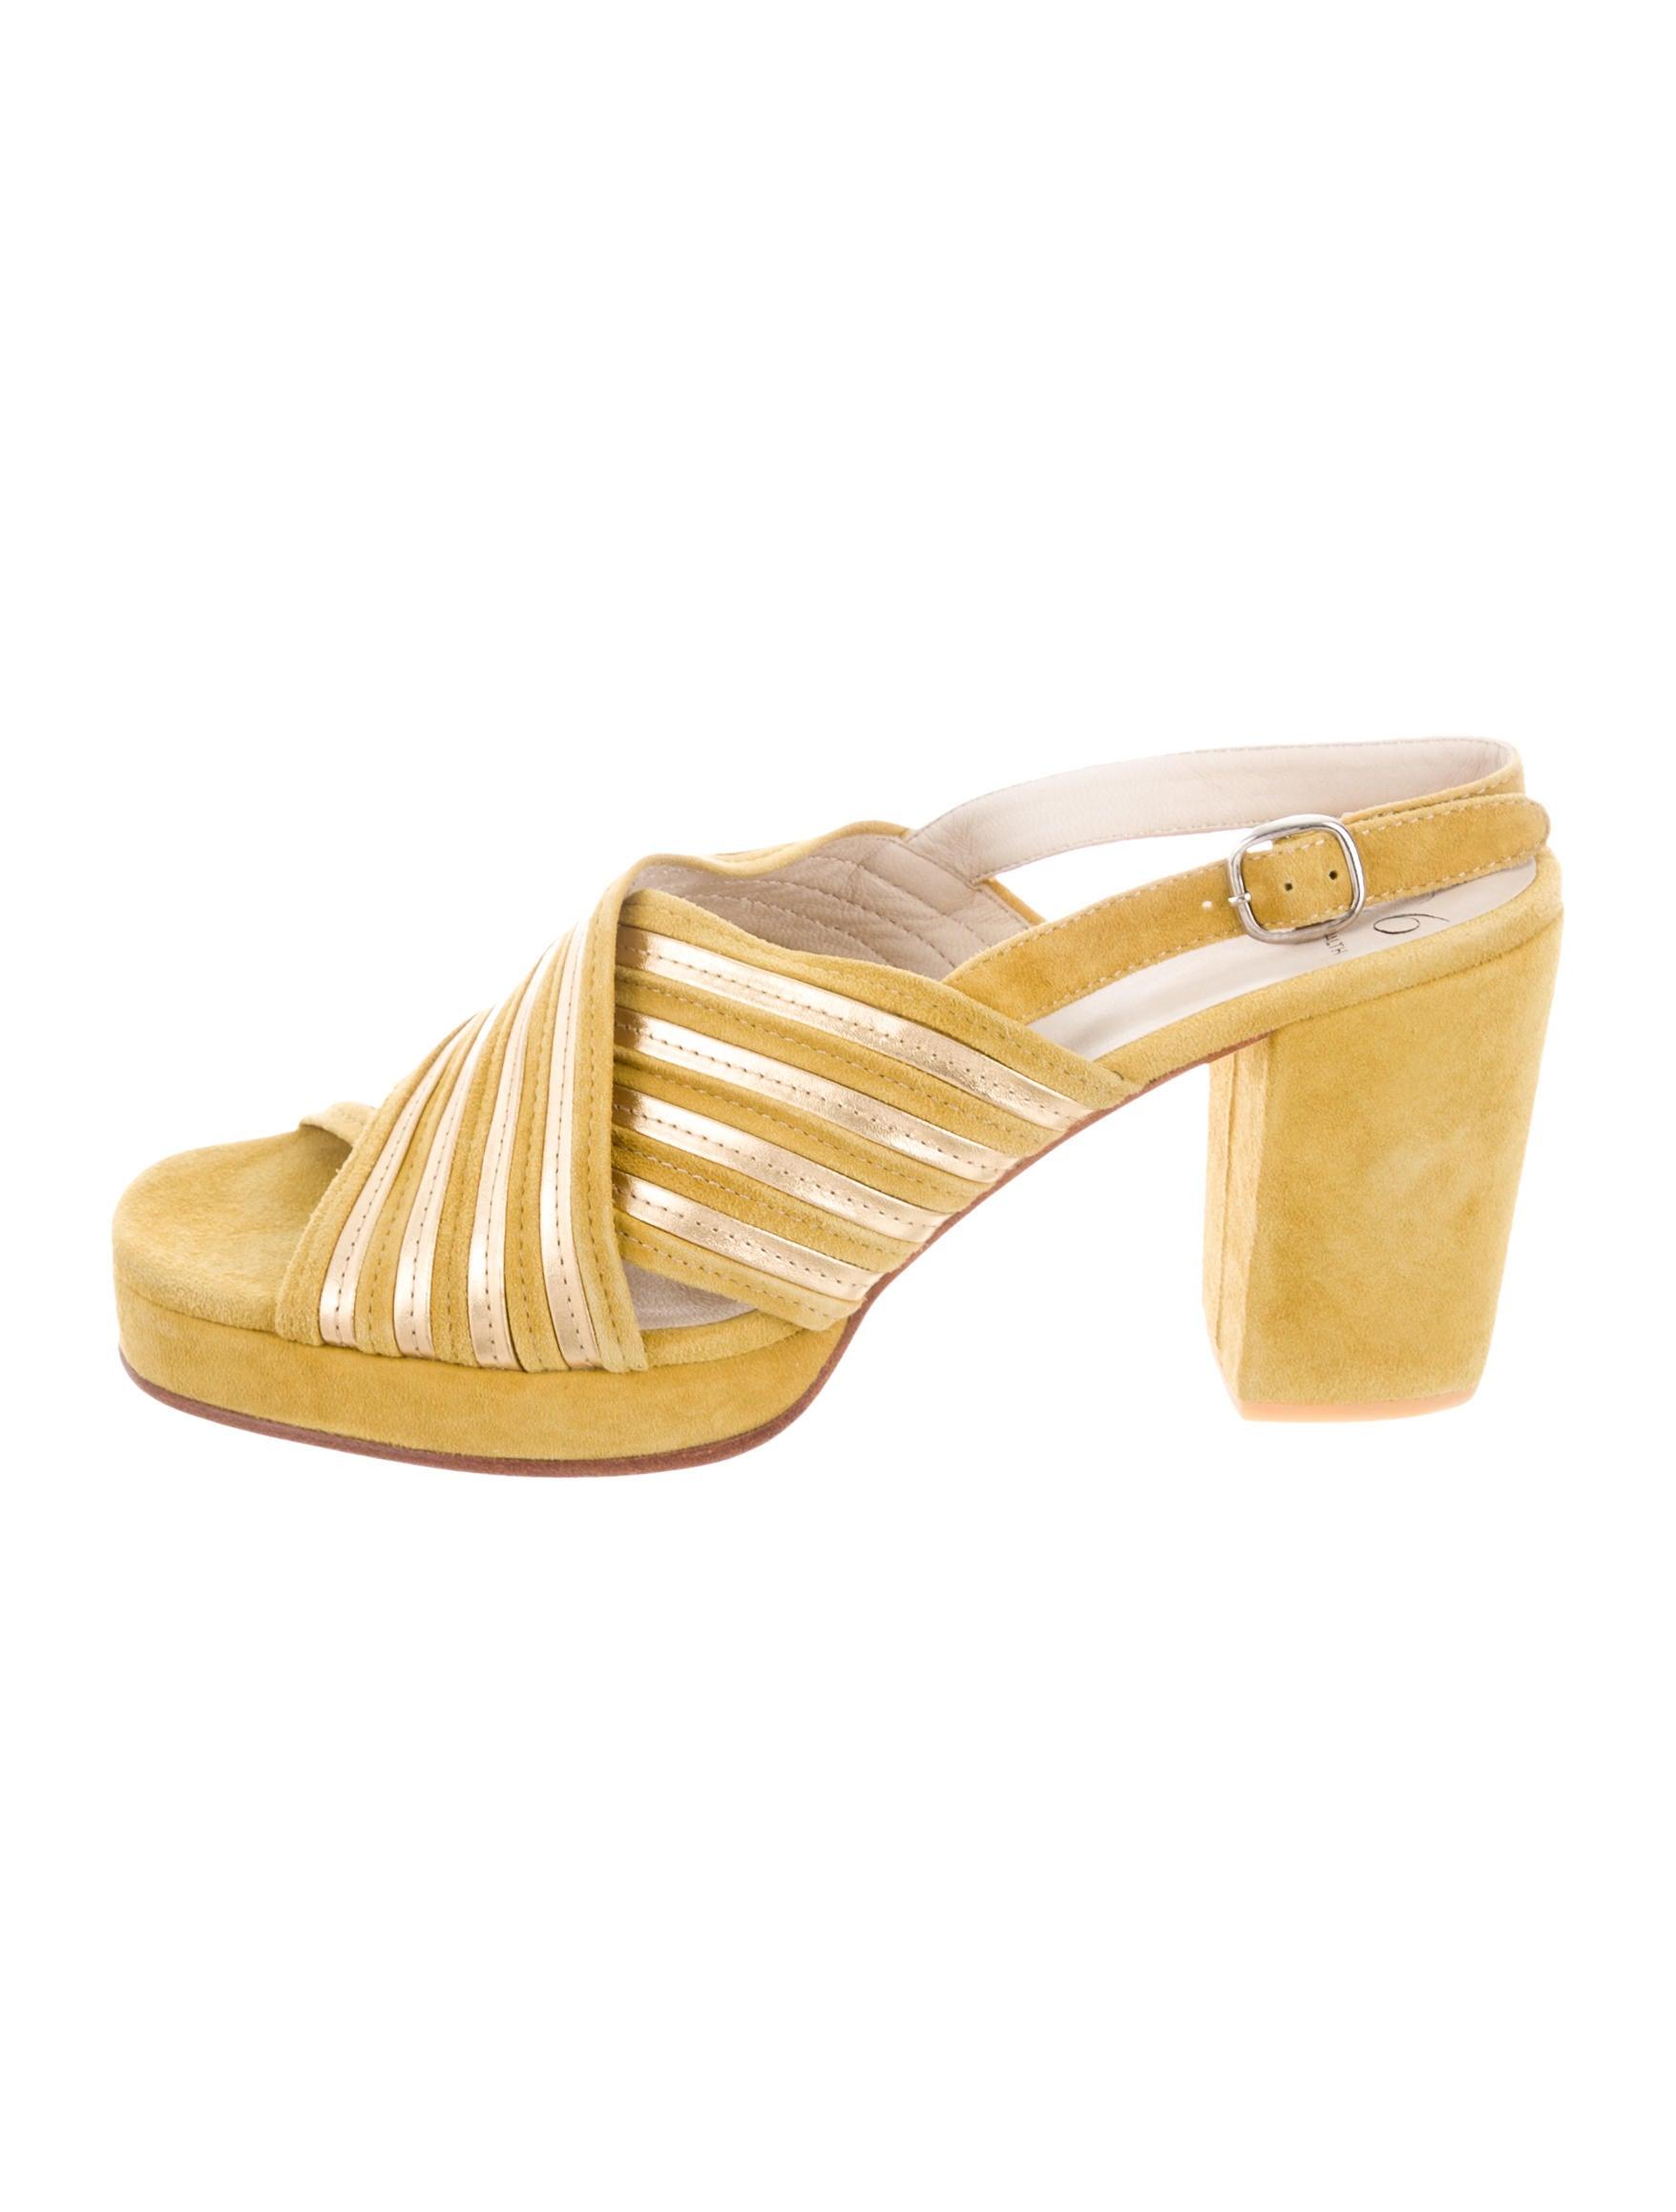 shop offer cheap price No.6 Lola Platform Sandals sMw9pcK